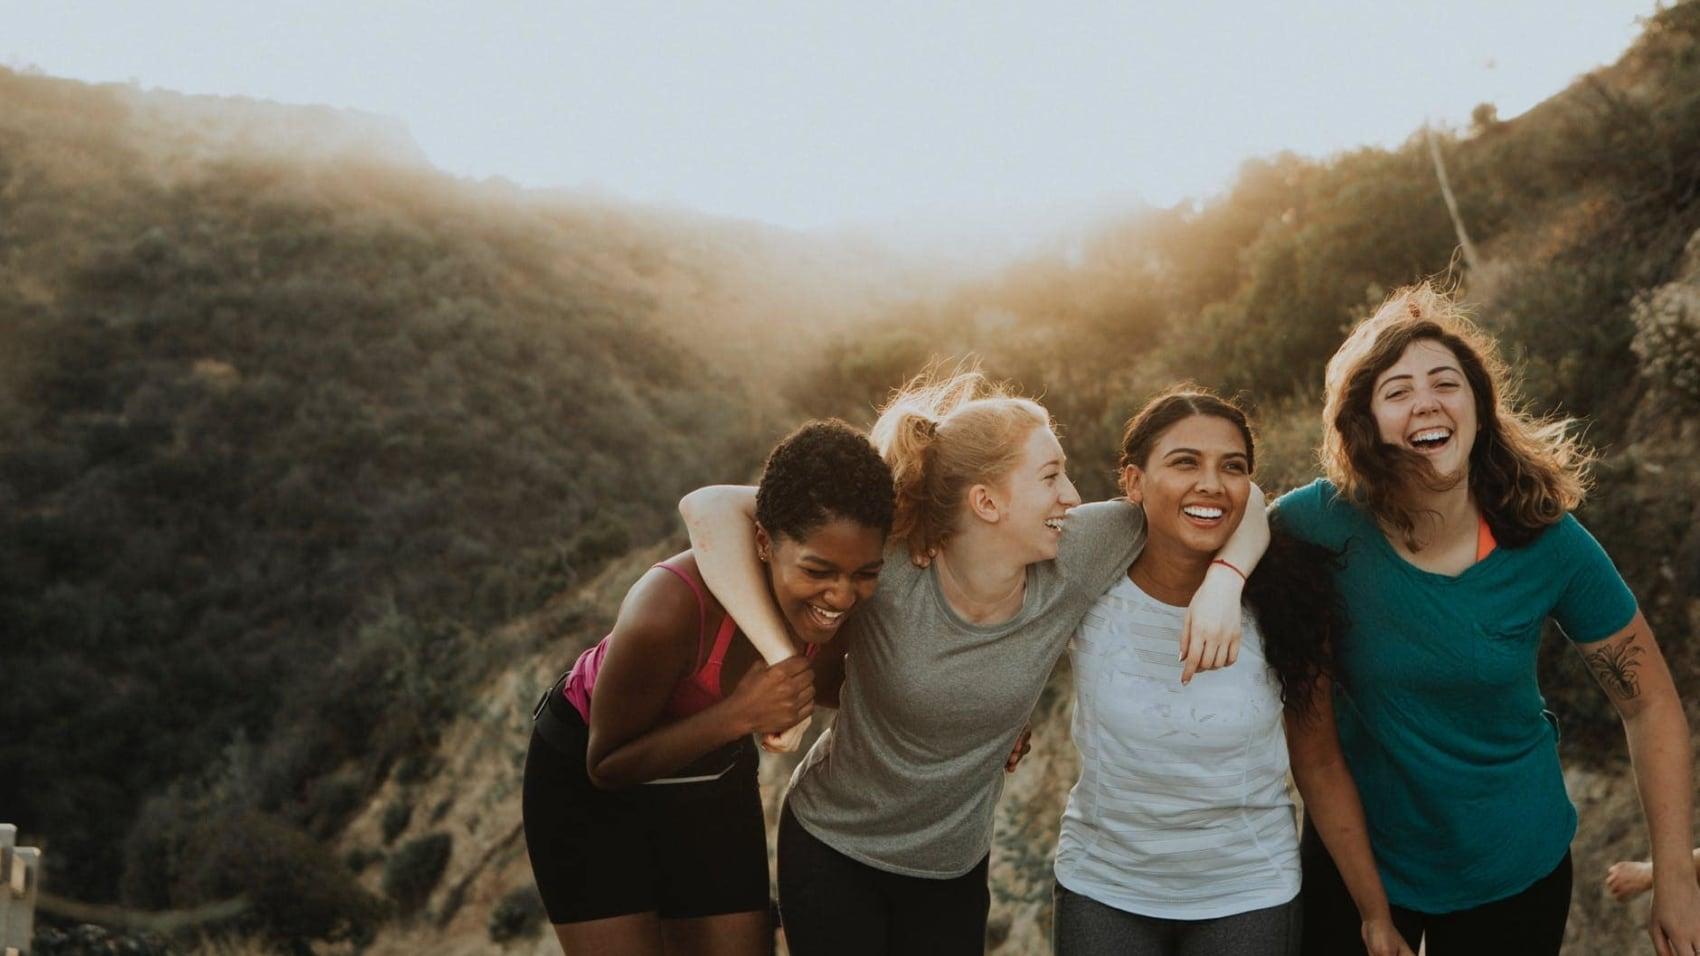 No More Mean Girls! Raising Strong Women Who Do Not Judge